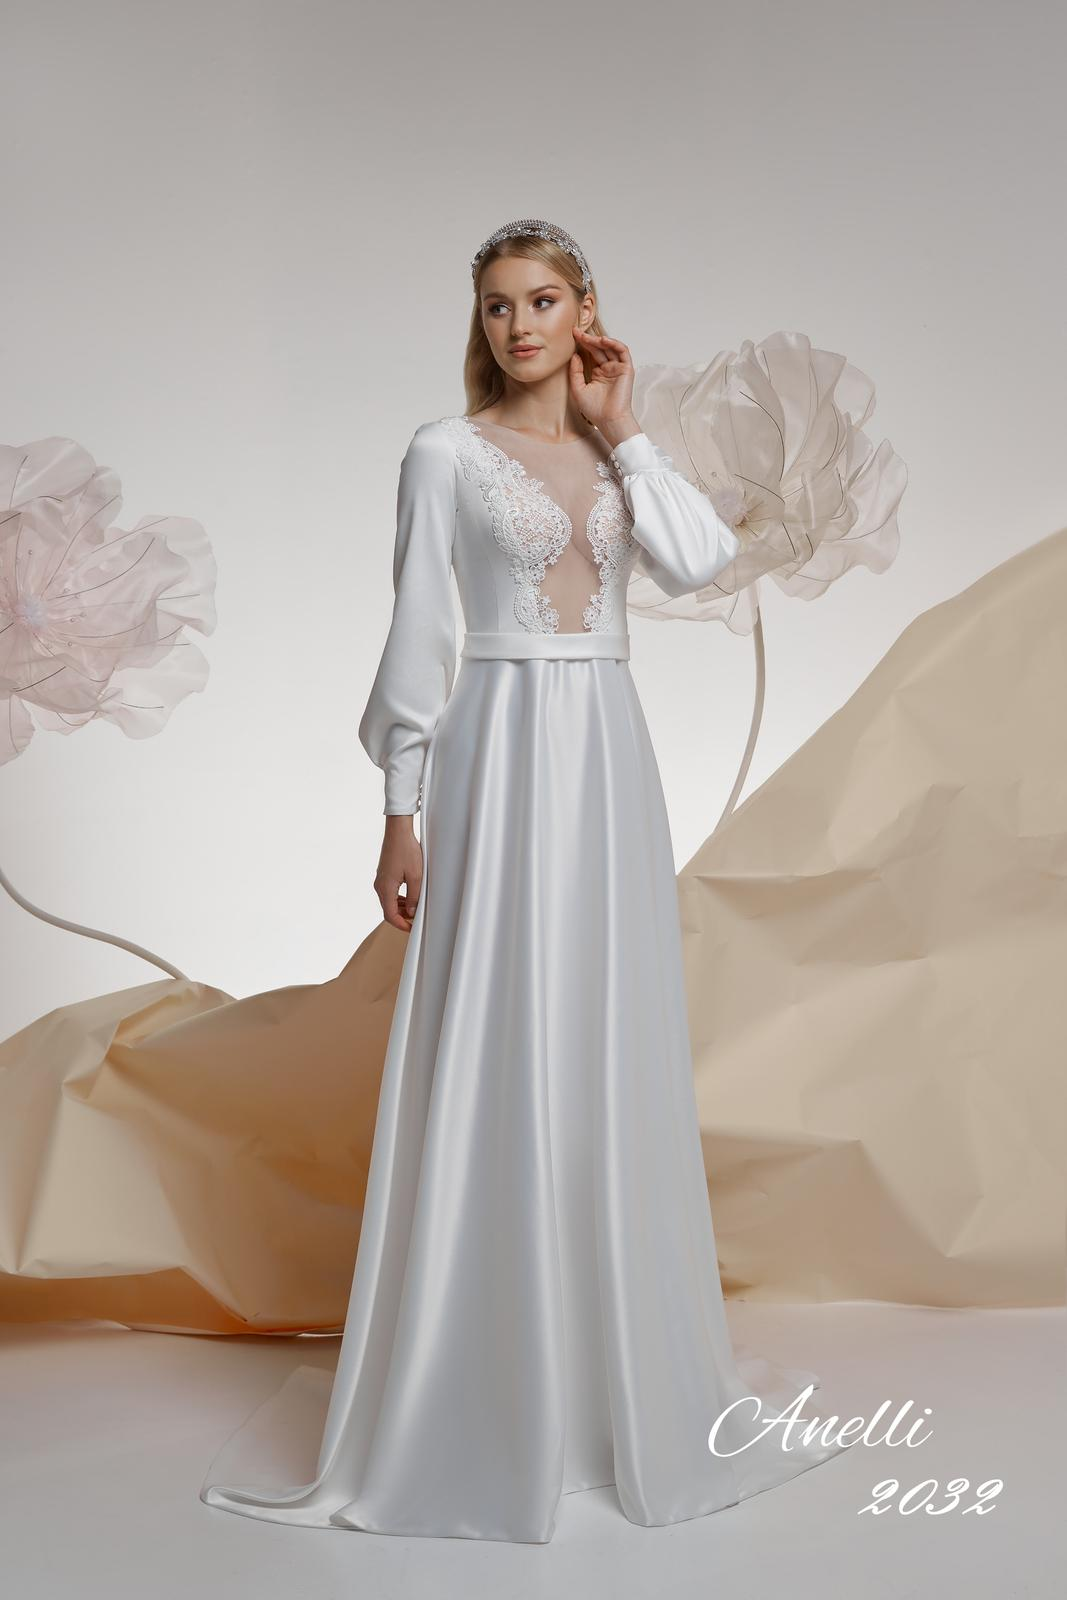 Svadobné šaty - Imagine 2032 - Obrázok č. 1